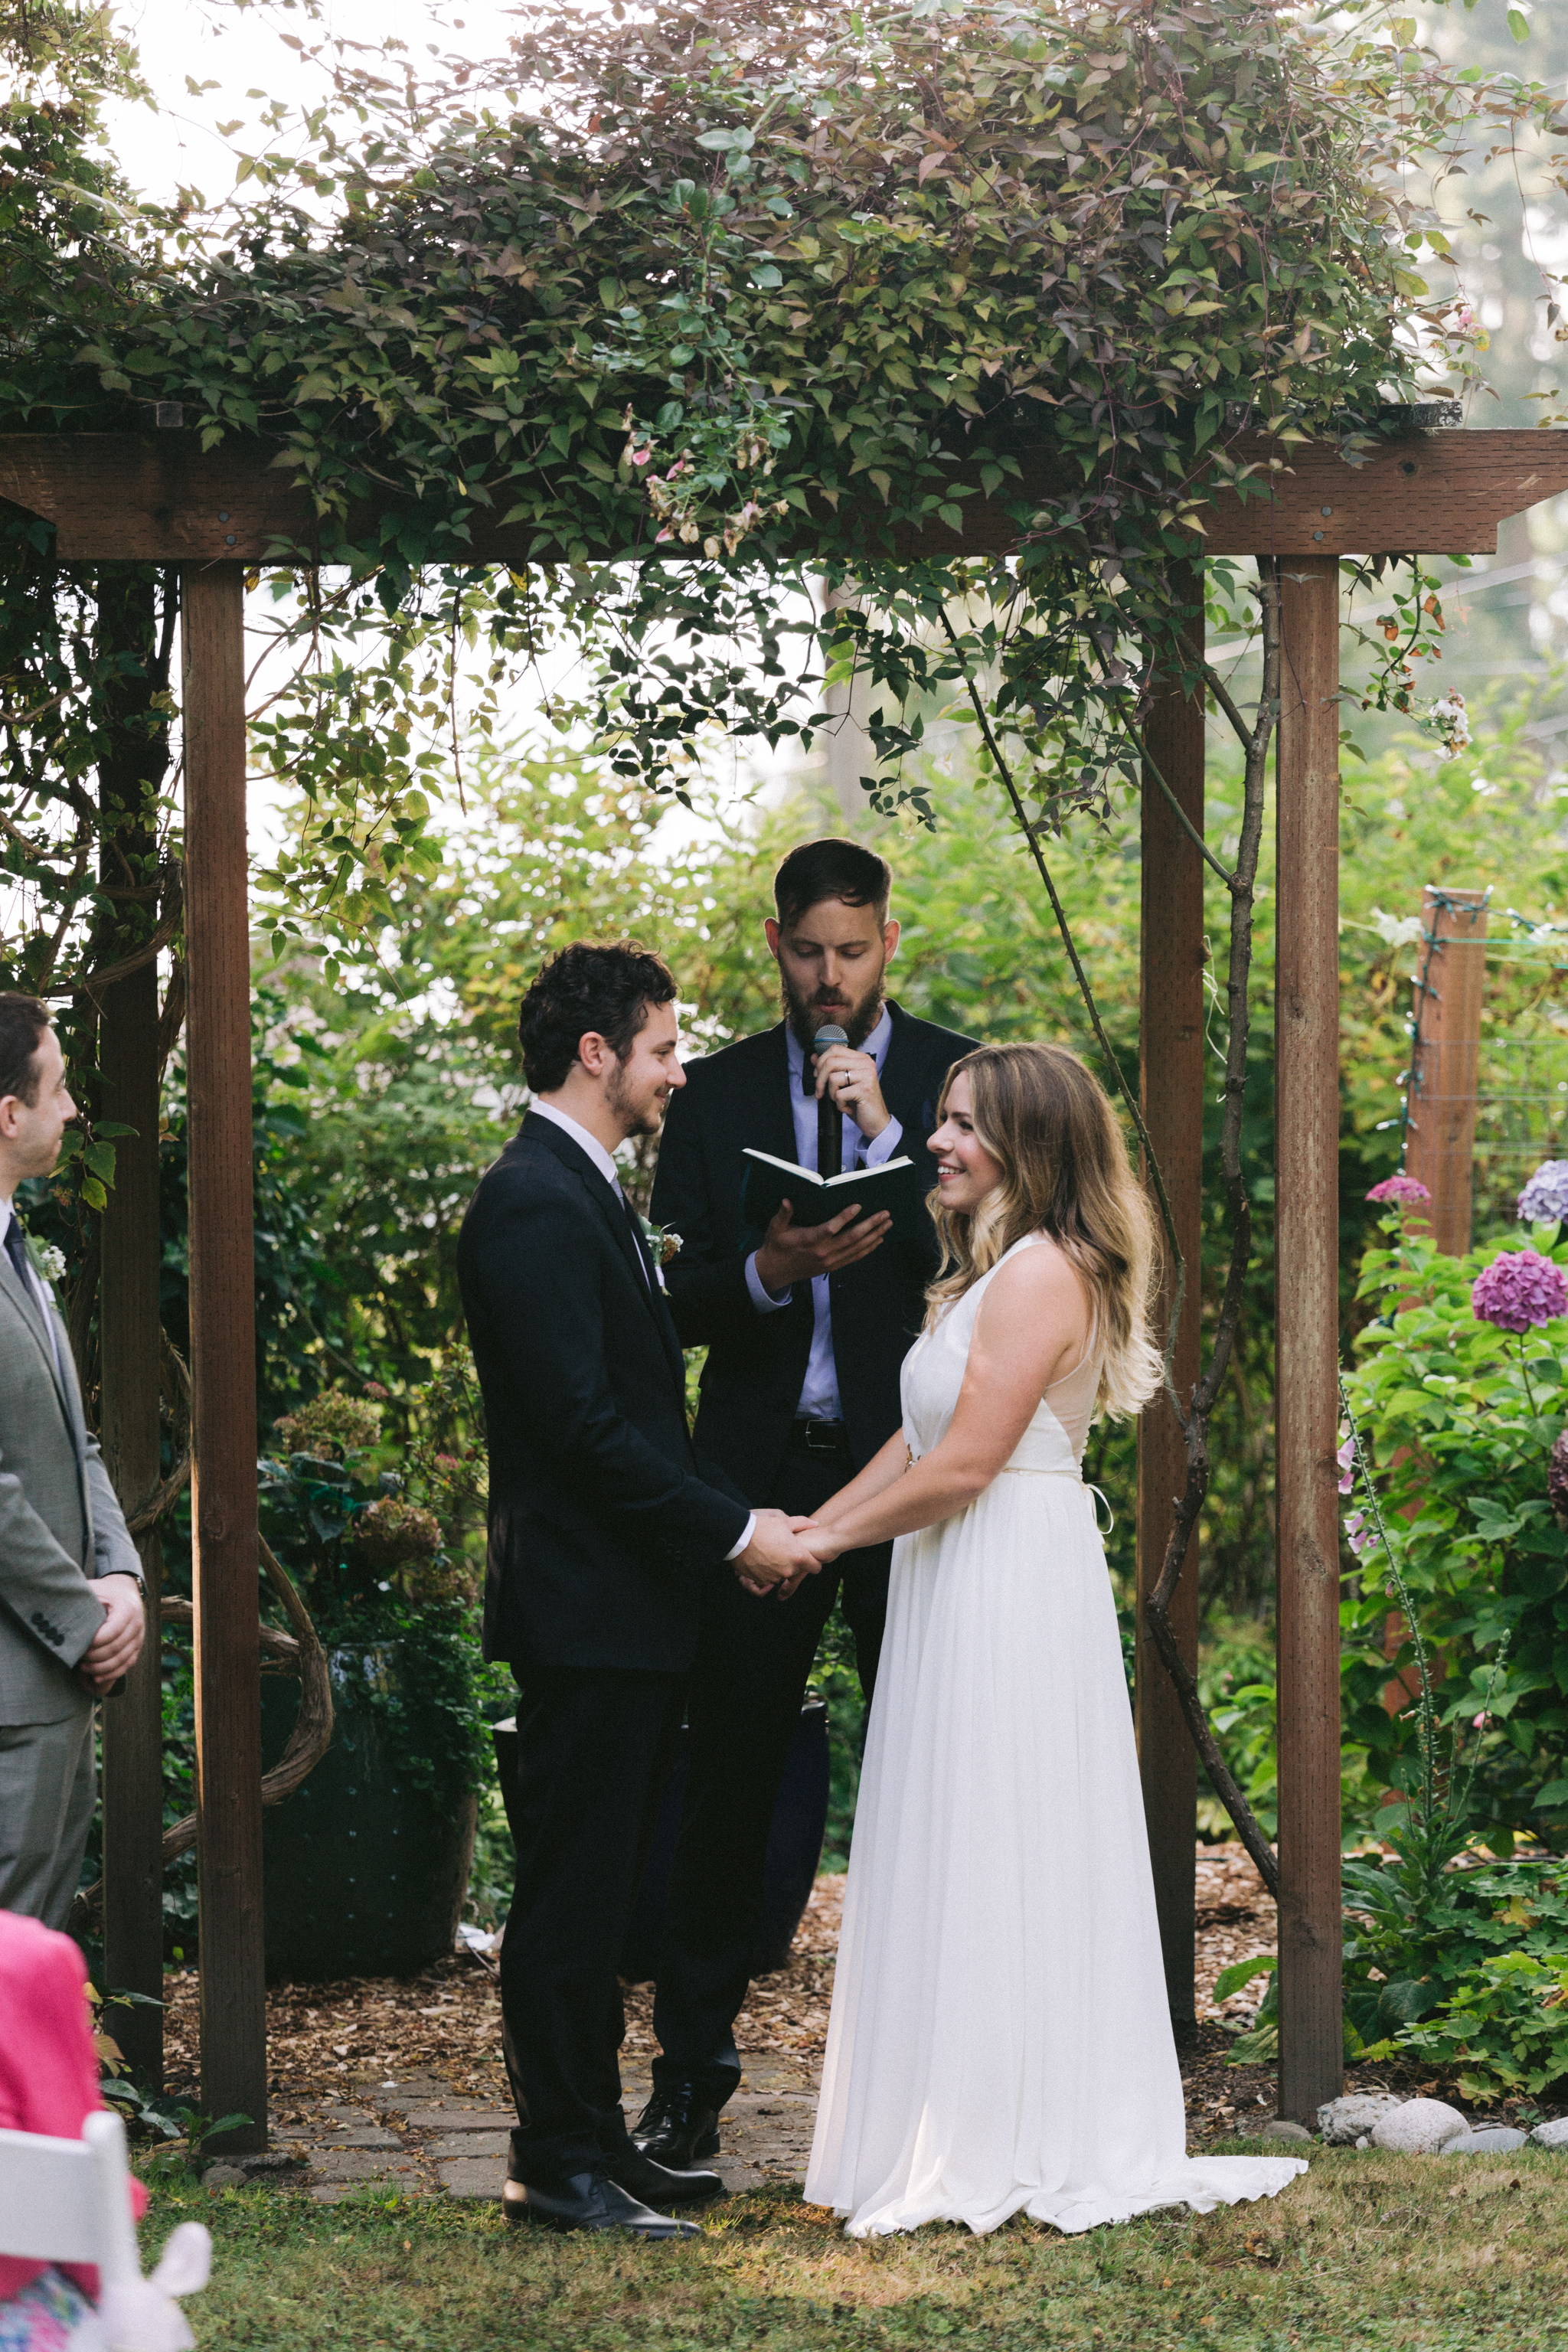 Backyard-Bainbridge-Island-Wedding-Alycia-Lovell-Photography-98.JPG